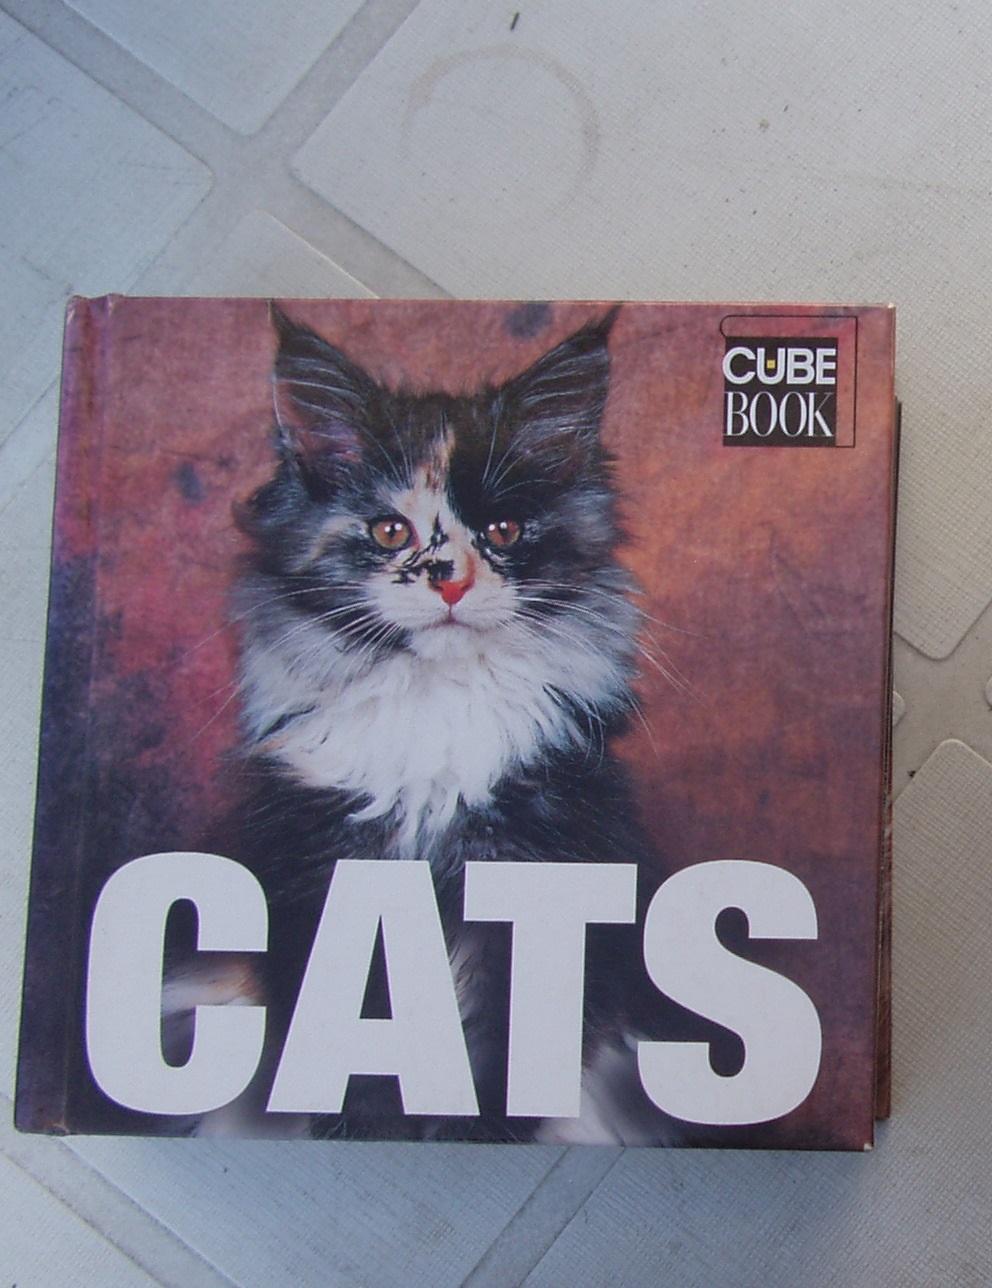 Cats (Cube Books) by Di Trana, Caterina Gromis - Hard cover